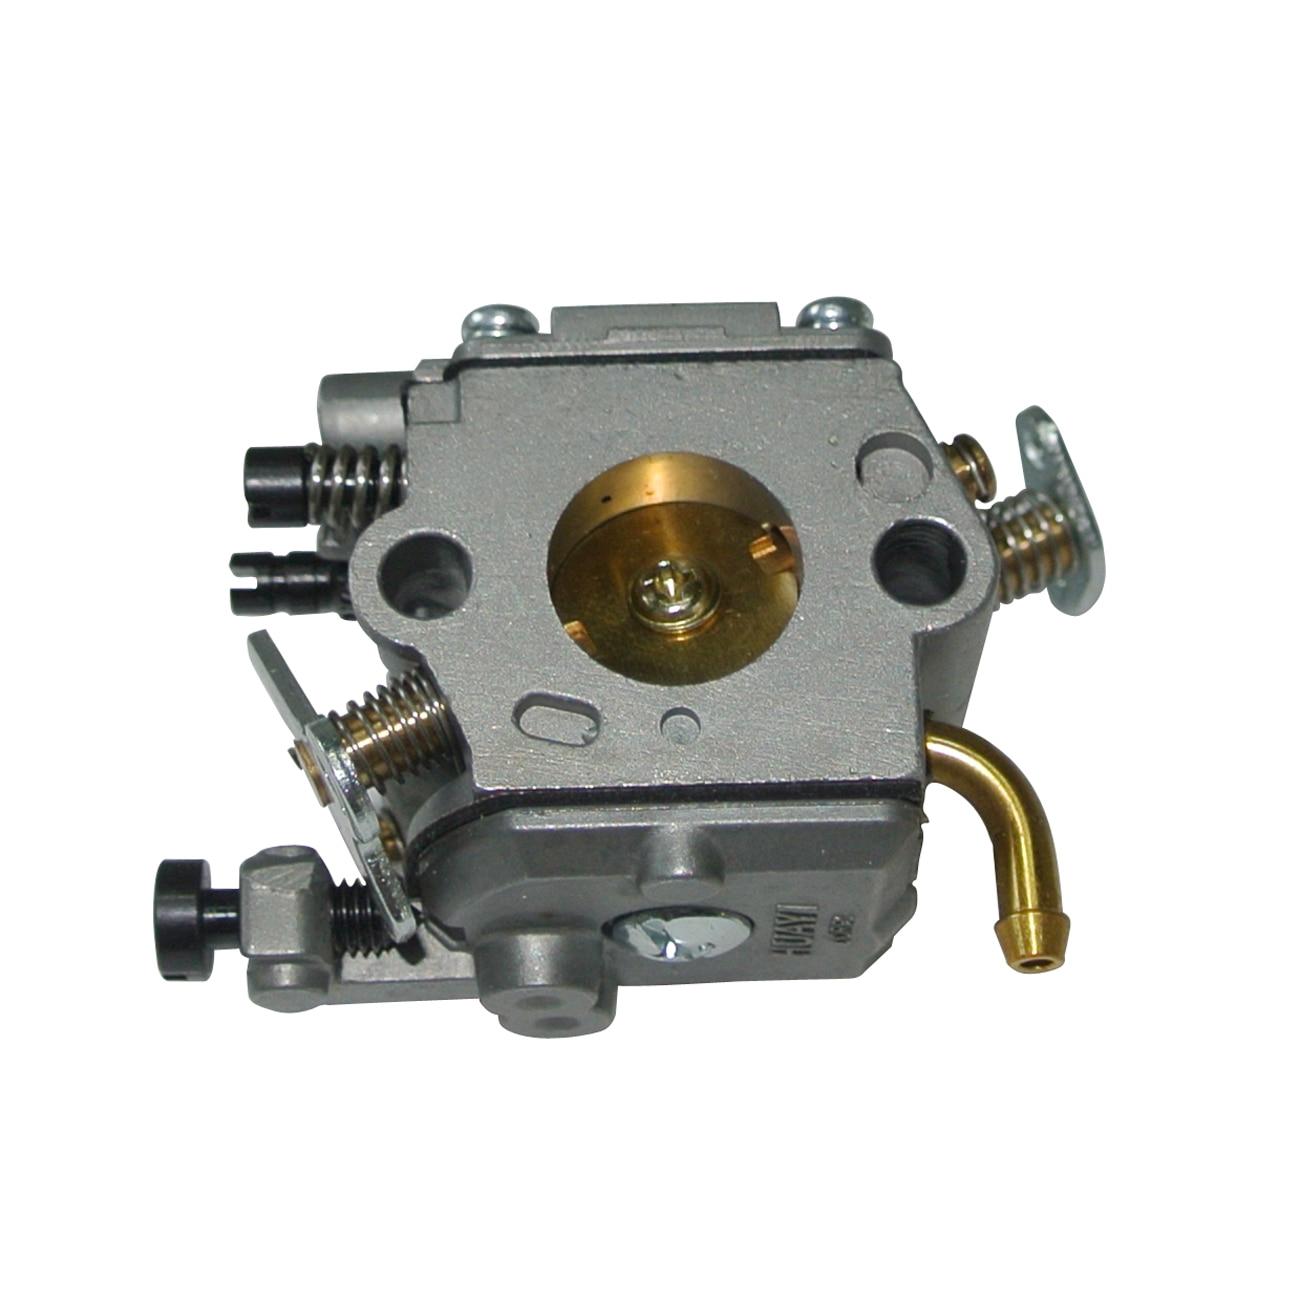 Карбюратор для бензопилы STIHL MS200 MS200T 020T MS 200 MS 200T